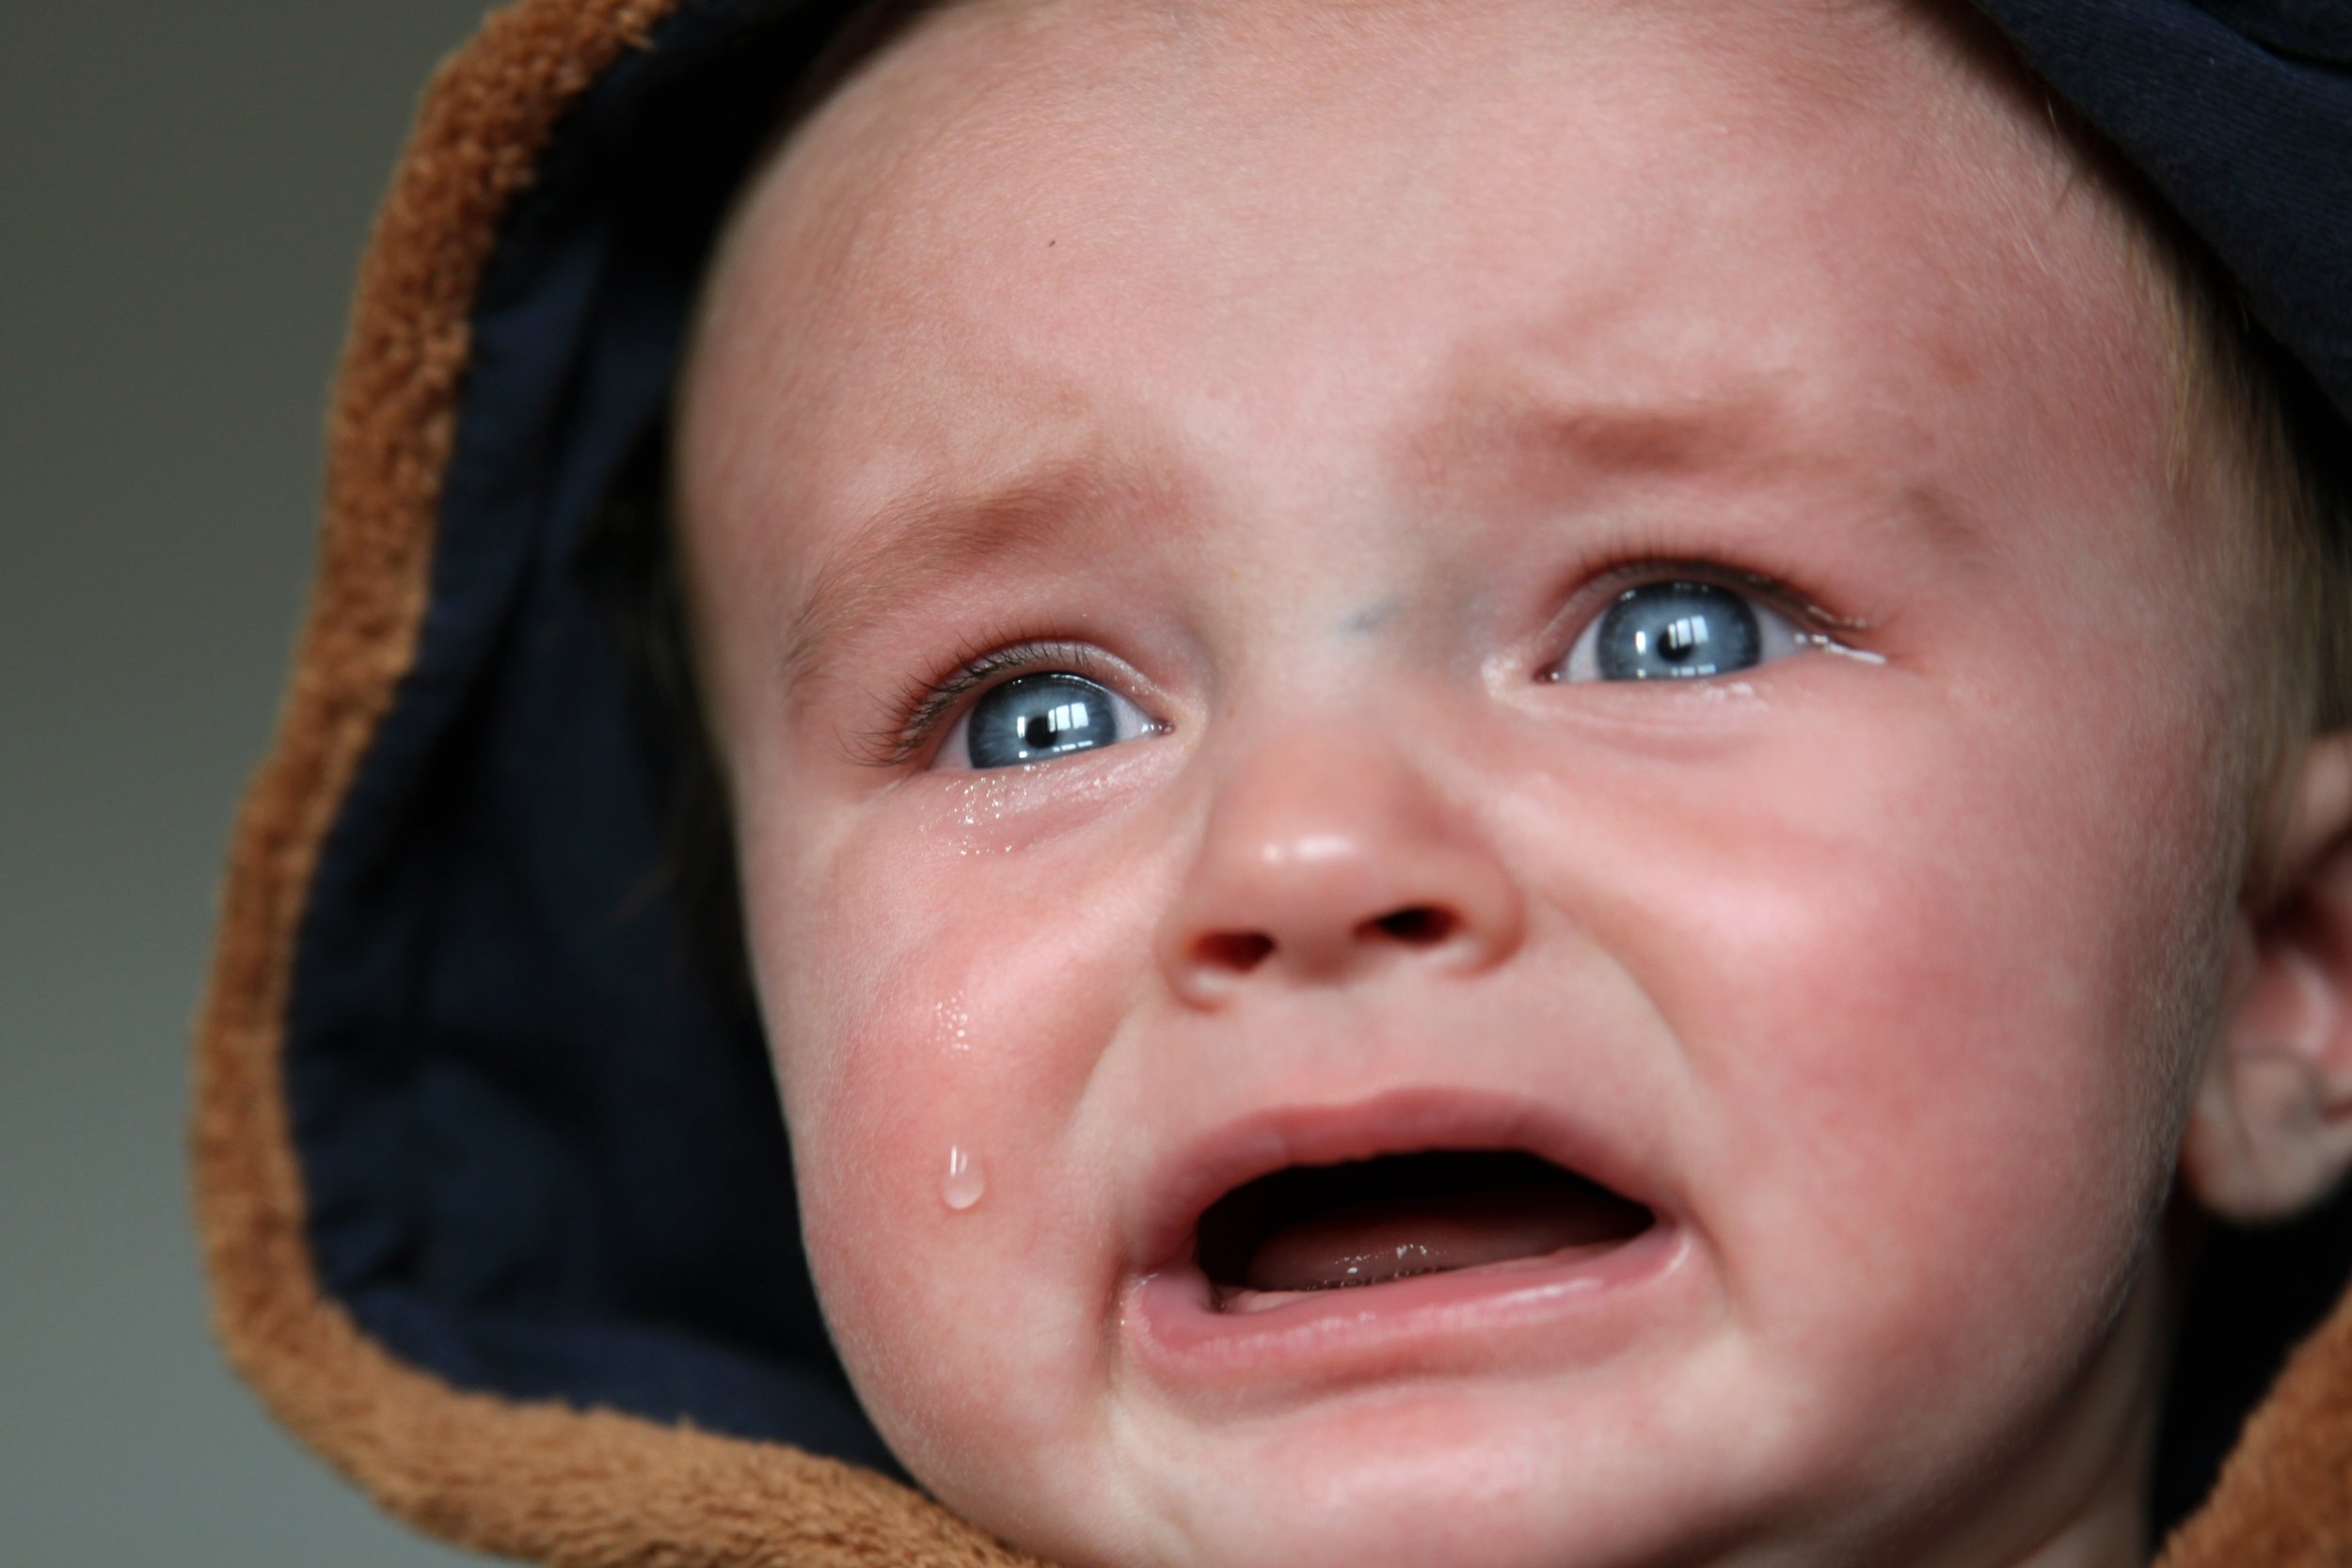 baby-tears-small-child-sad-47090.jpg